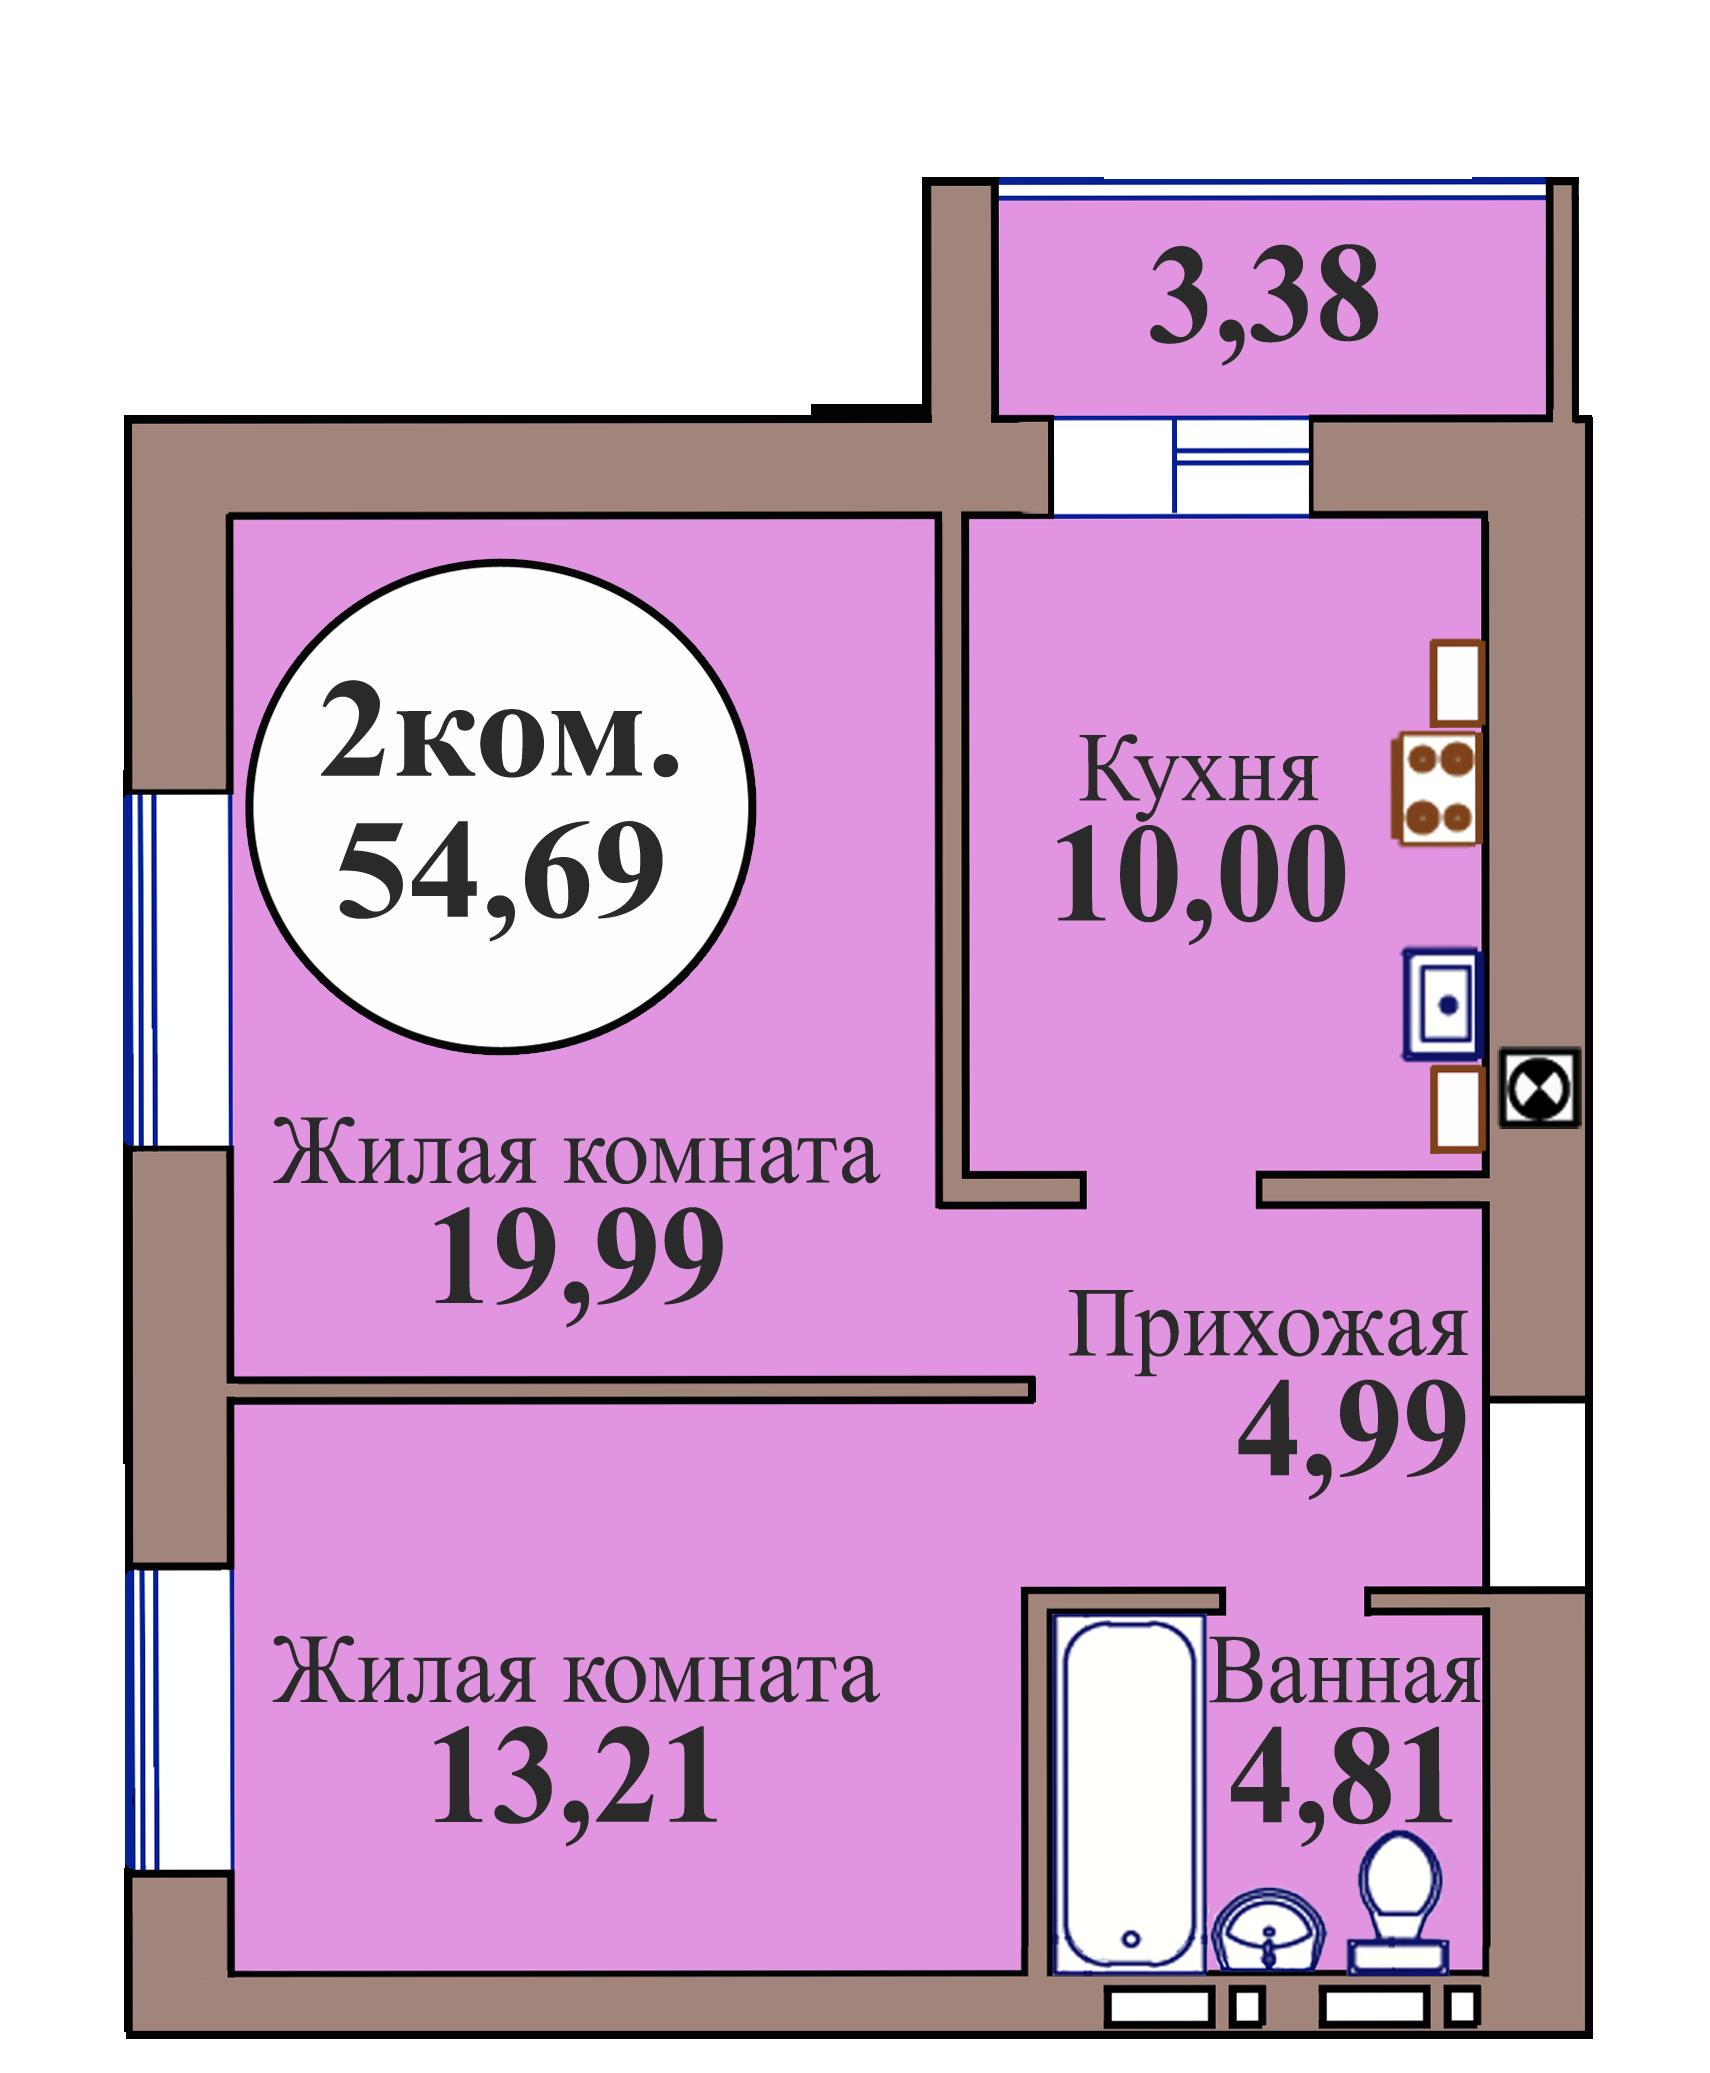 2-комн. кв. по пер. Калининградский, 5 кв. 233 в Калининграде